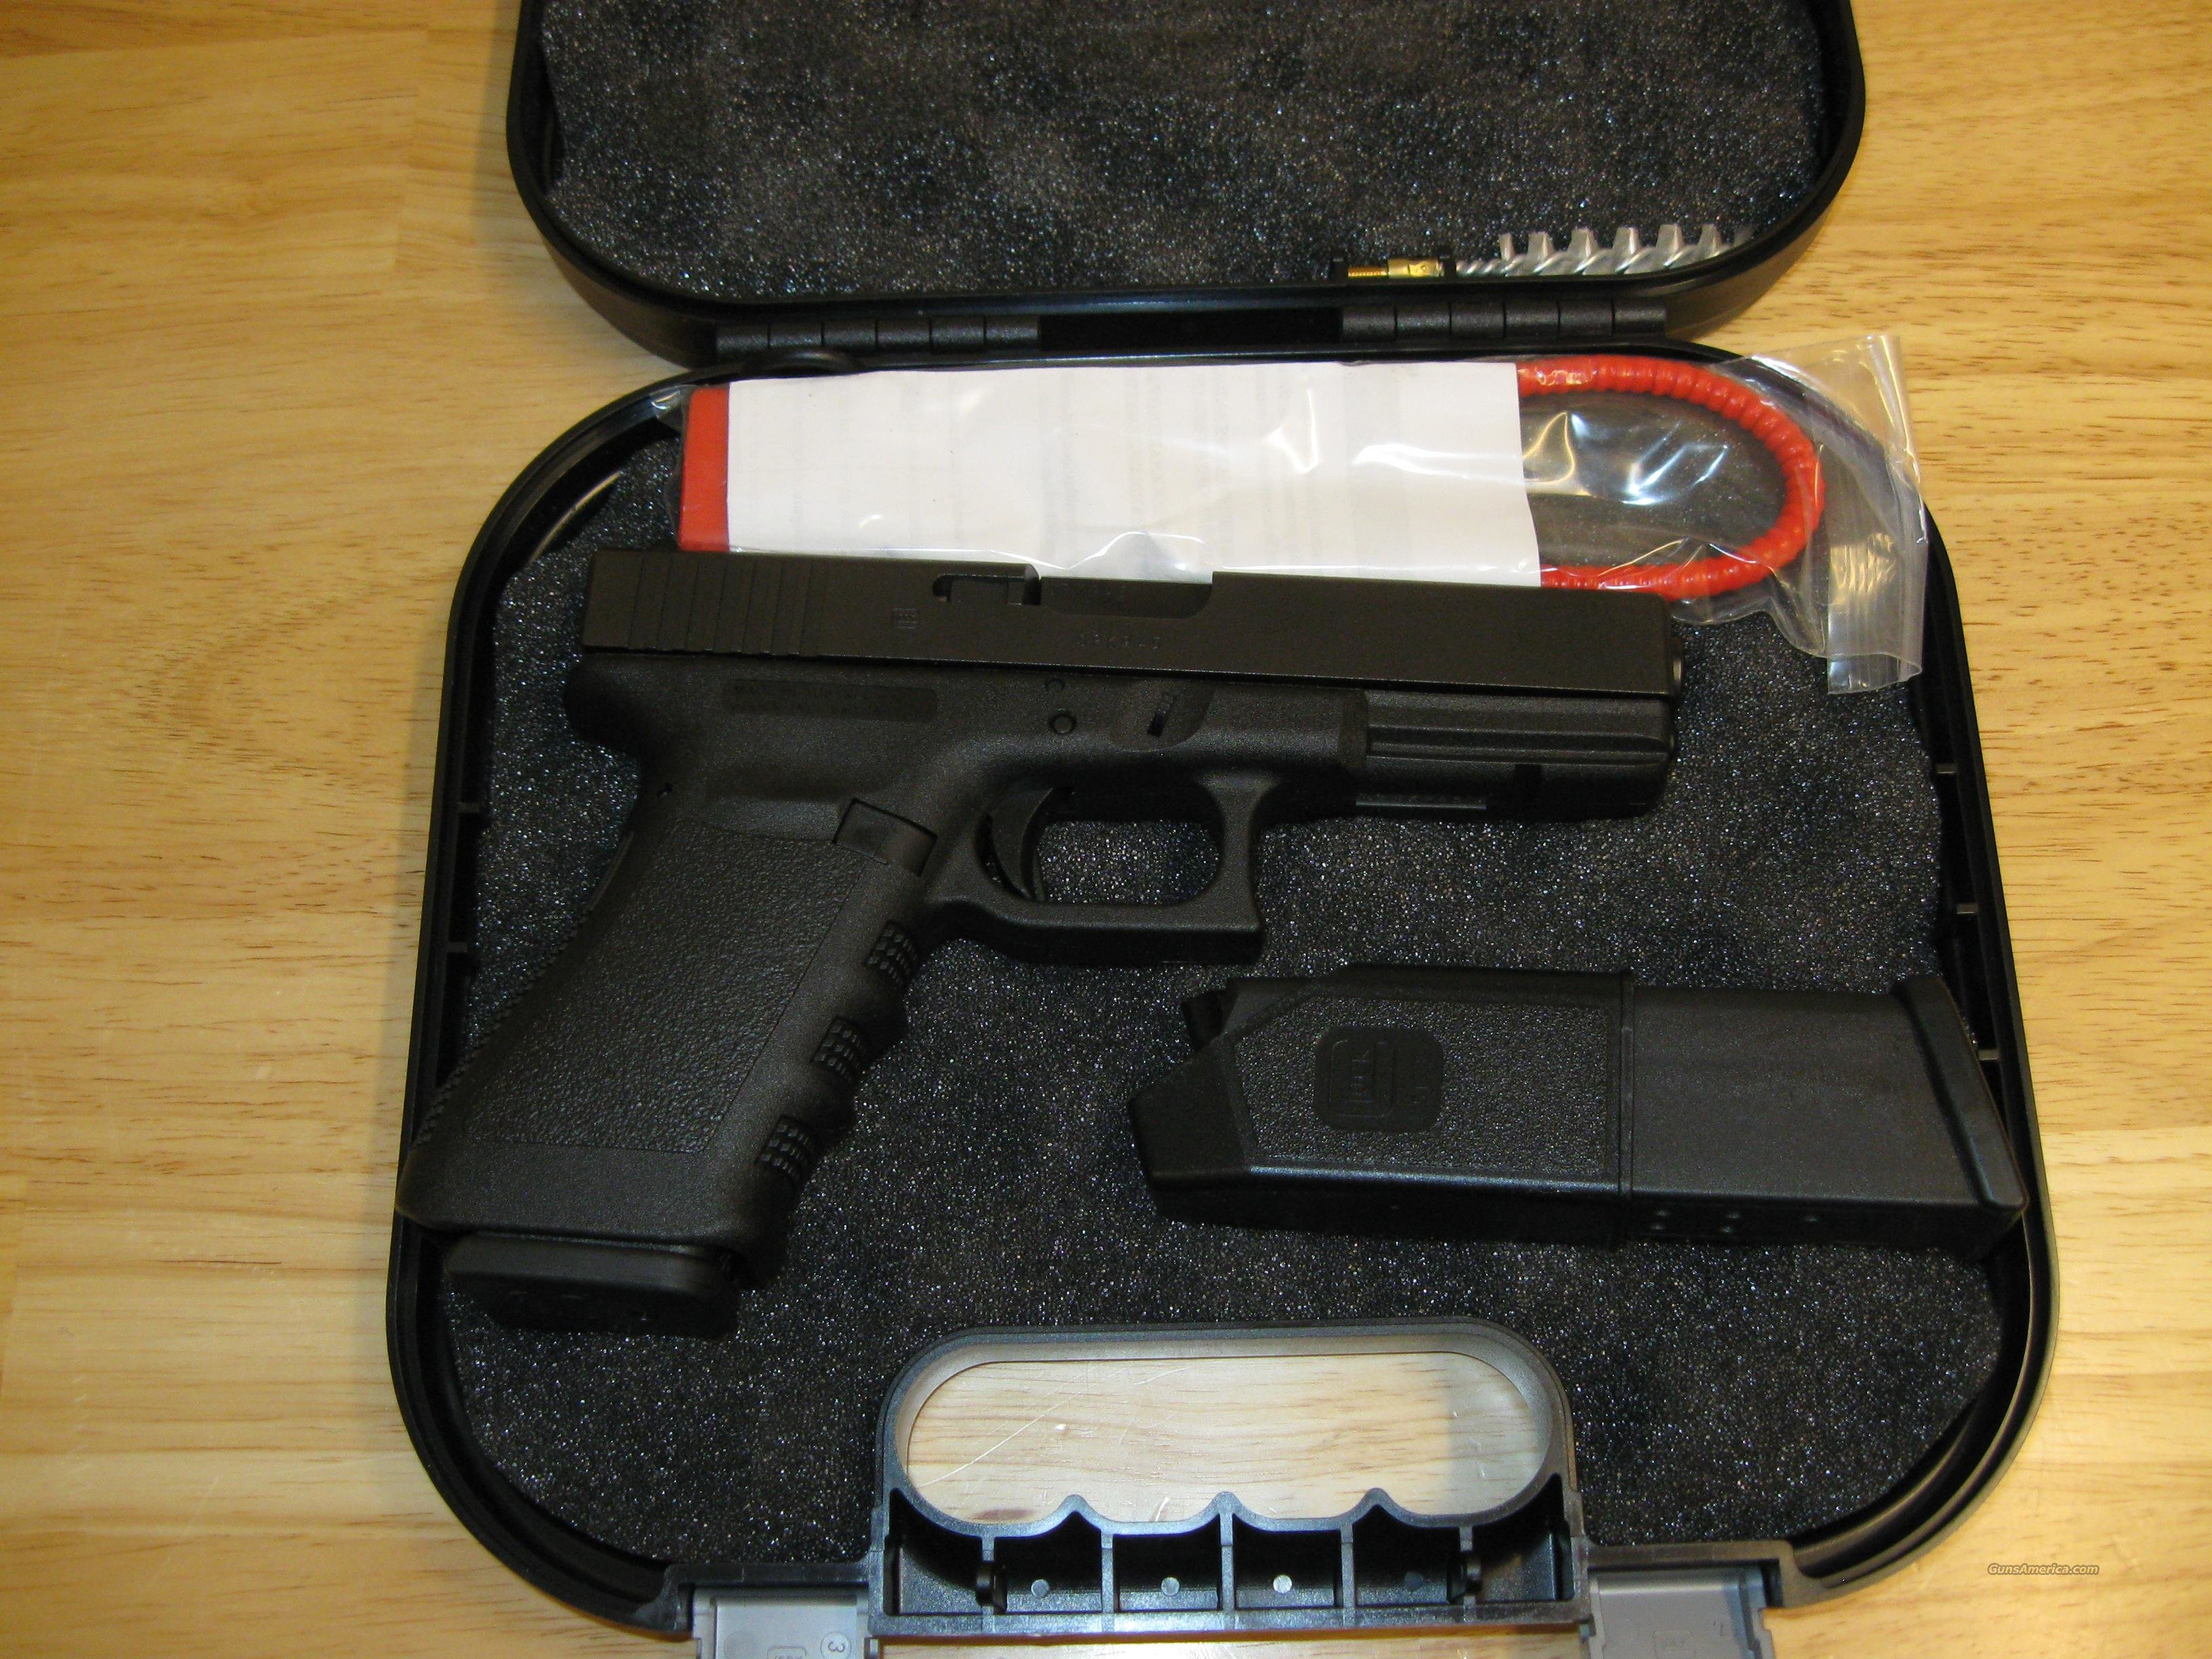 Glock Model 21 Standard Pistol PI2150203, 45 ACP, 4.60 in, Polymer Grip, Black Finish, Fixed Sights, 13 Rd  Guns > Pistols > Glock Pistols > 20/21